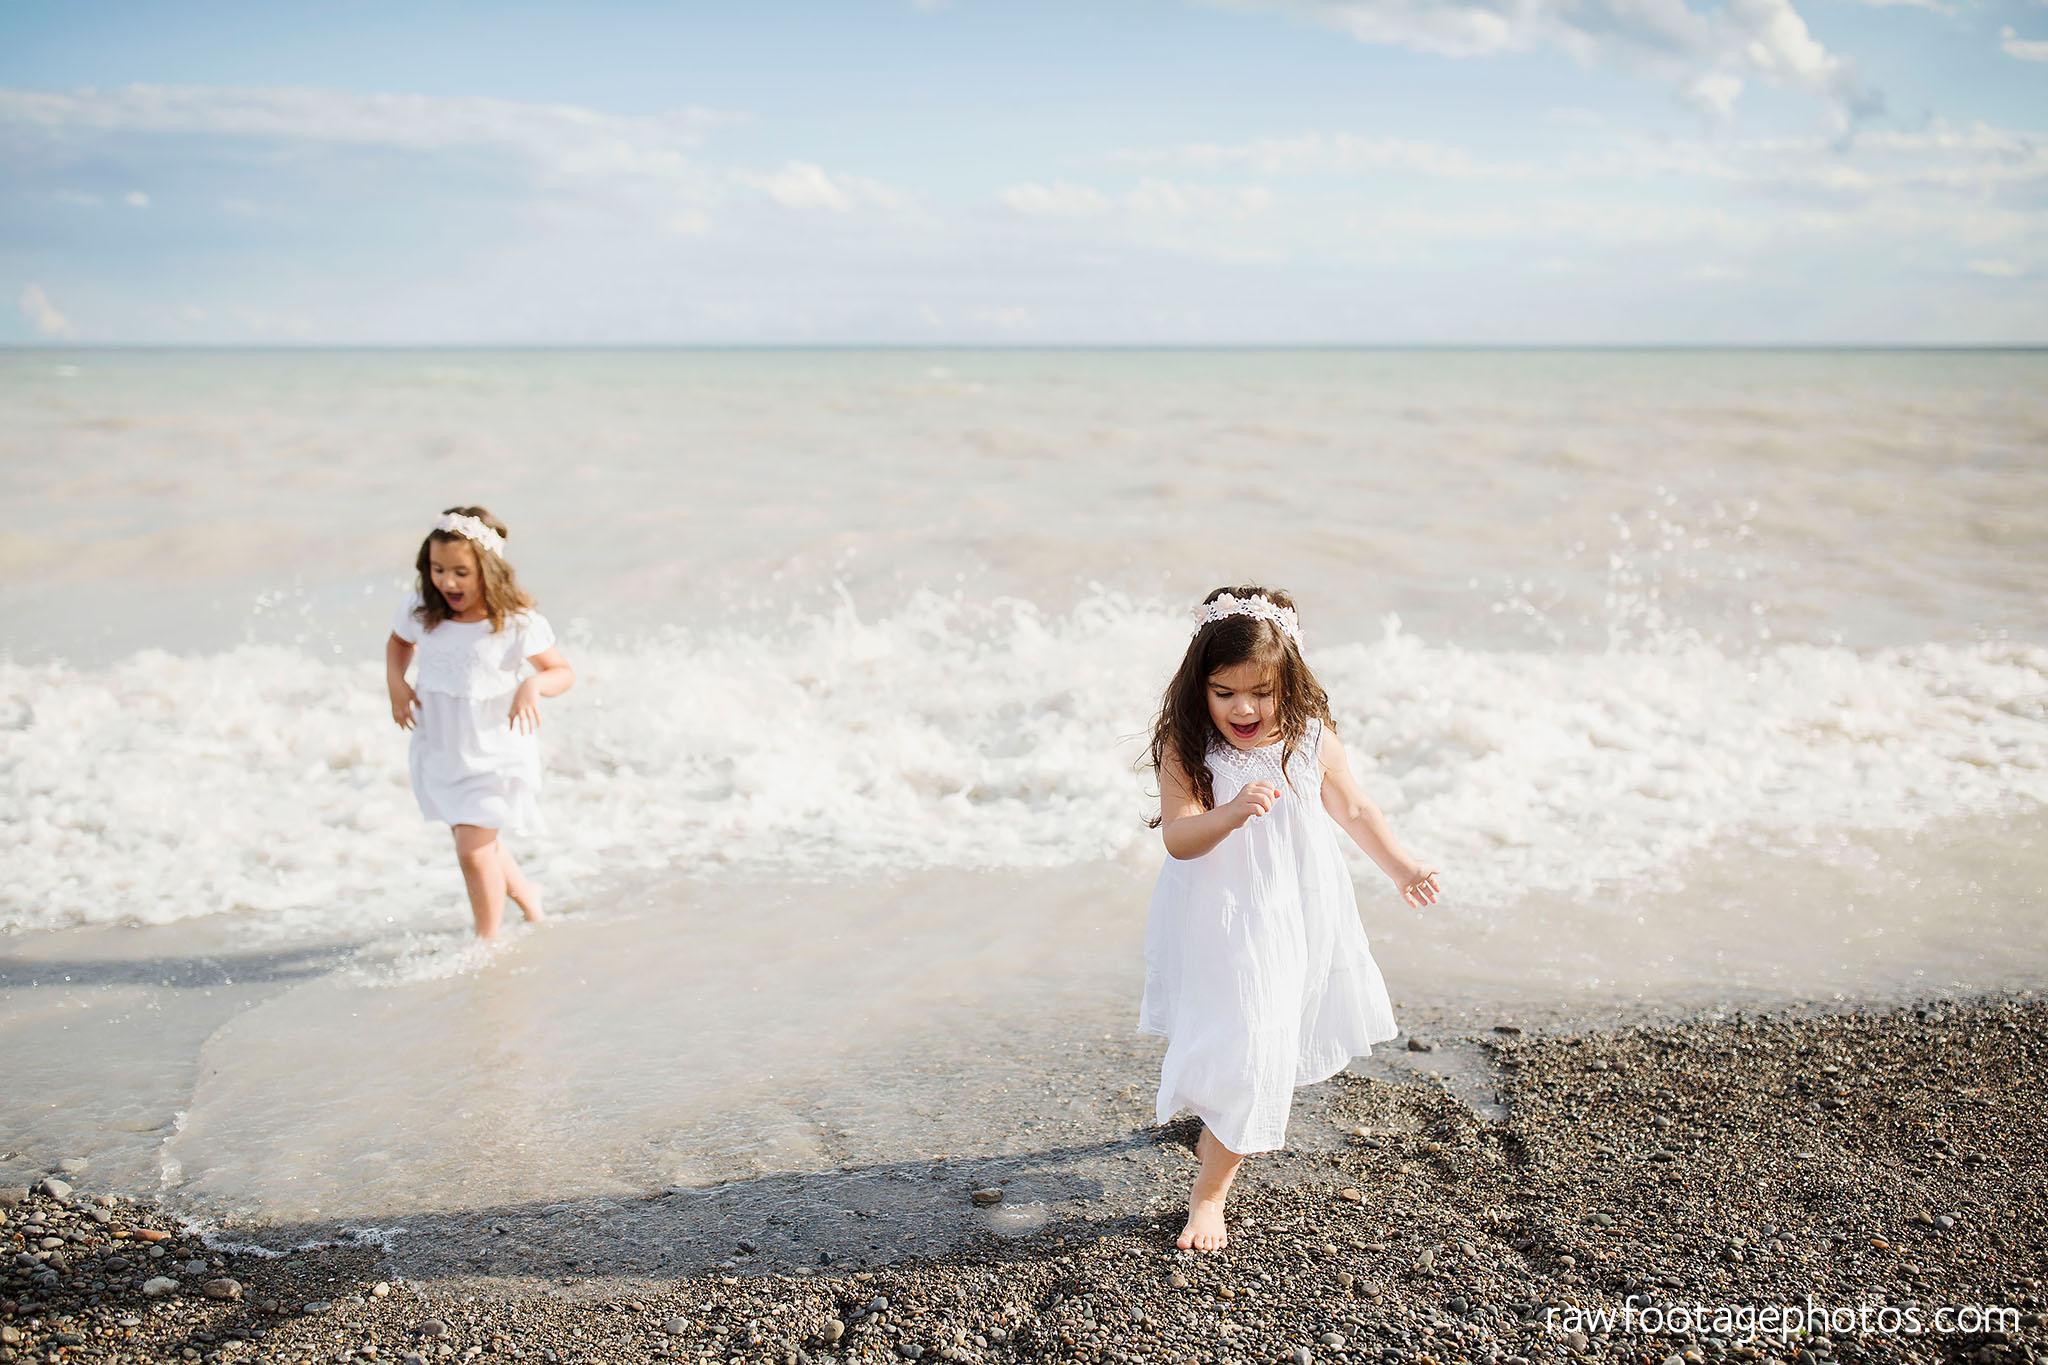 london_ontario_photographer-raw_footage_photography-beach_minis-port_stanley_beach-family_photographer-couple_photographer-lifestyle_photographer028.jpg